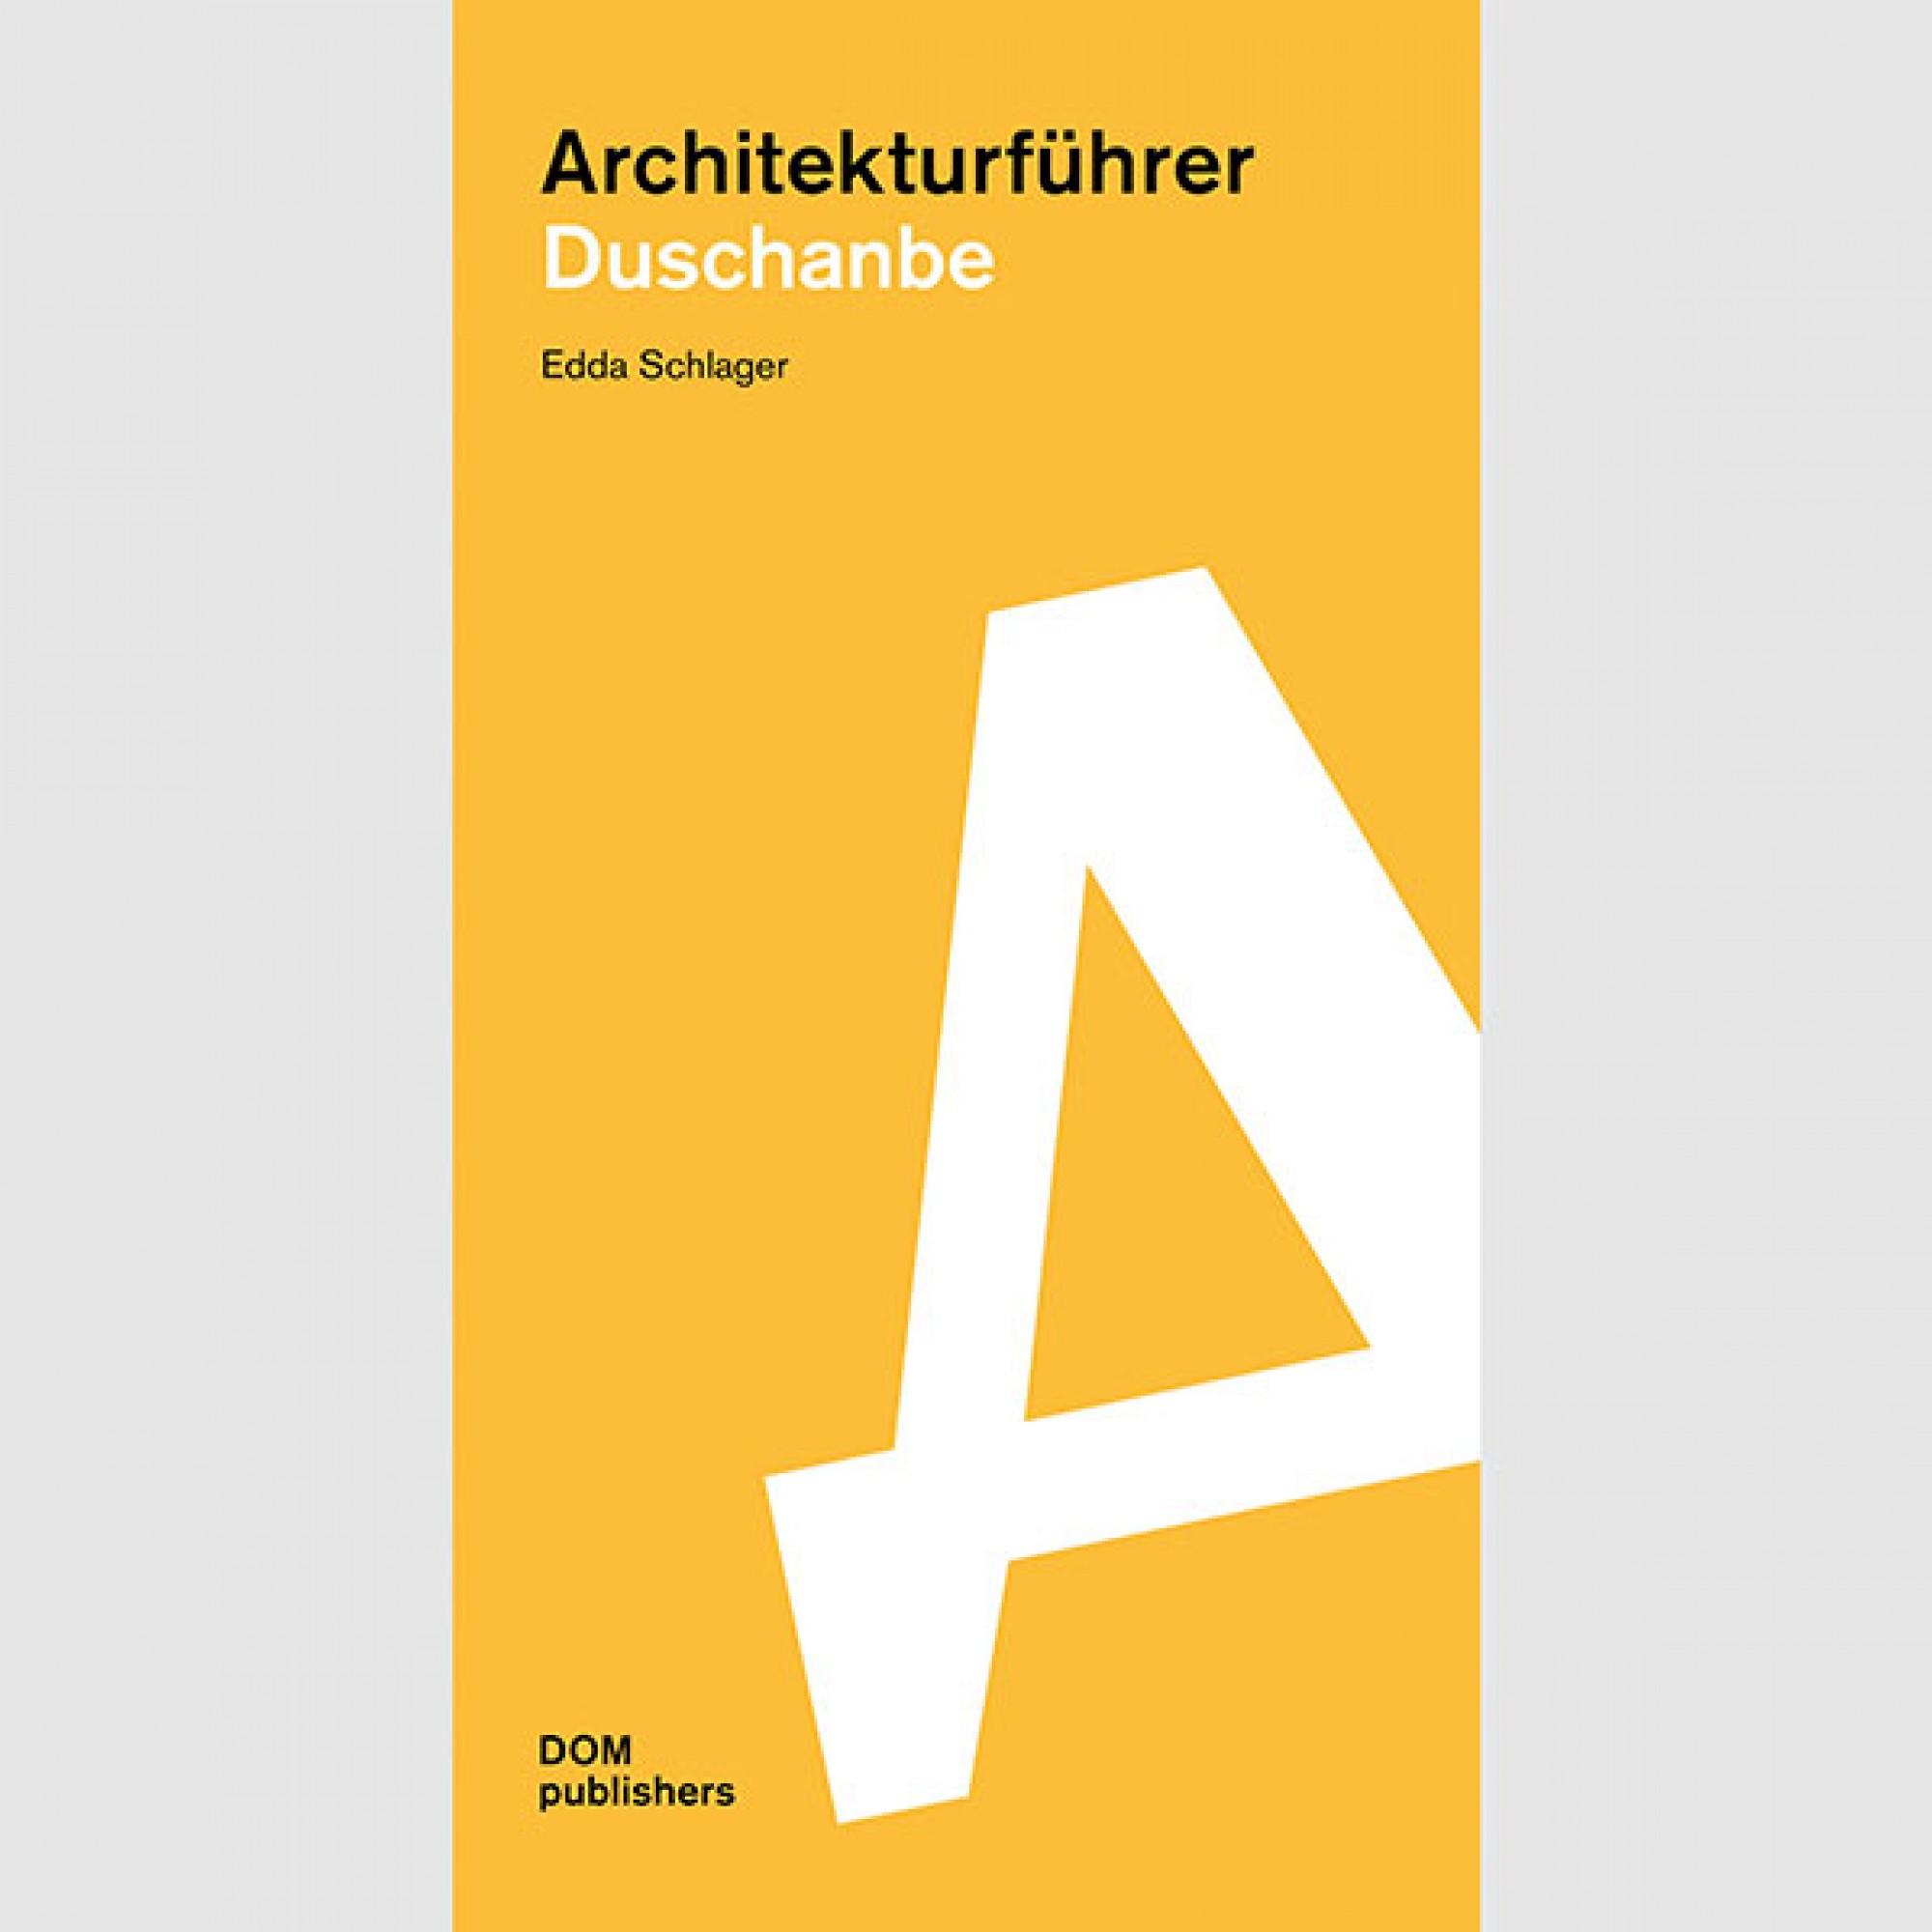 Architekturführer. (Dom Publishers)